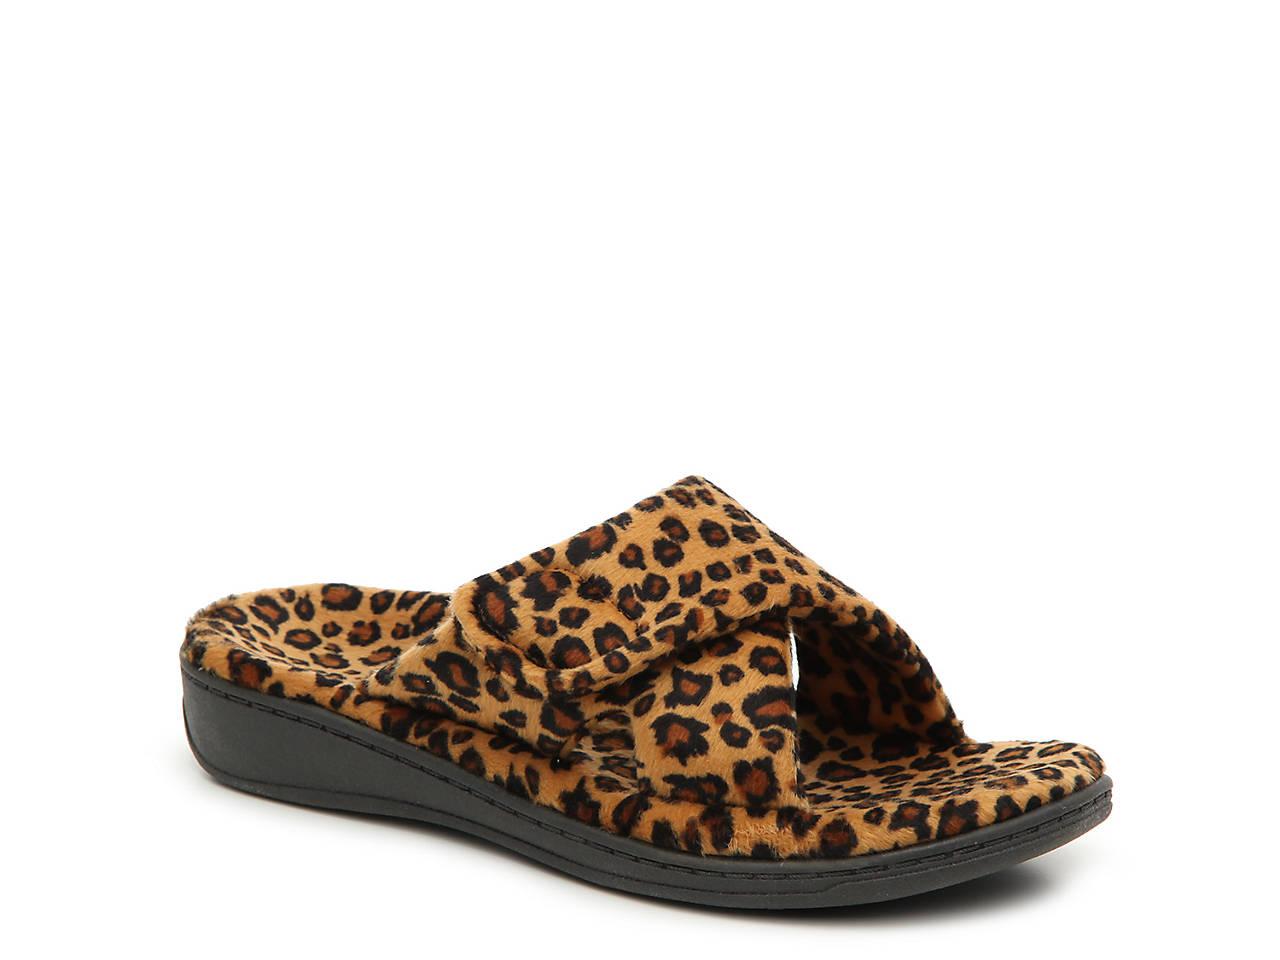 e18312484c6 Vionic Relax Slide Slipper Women s Shoes